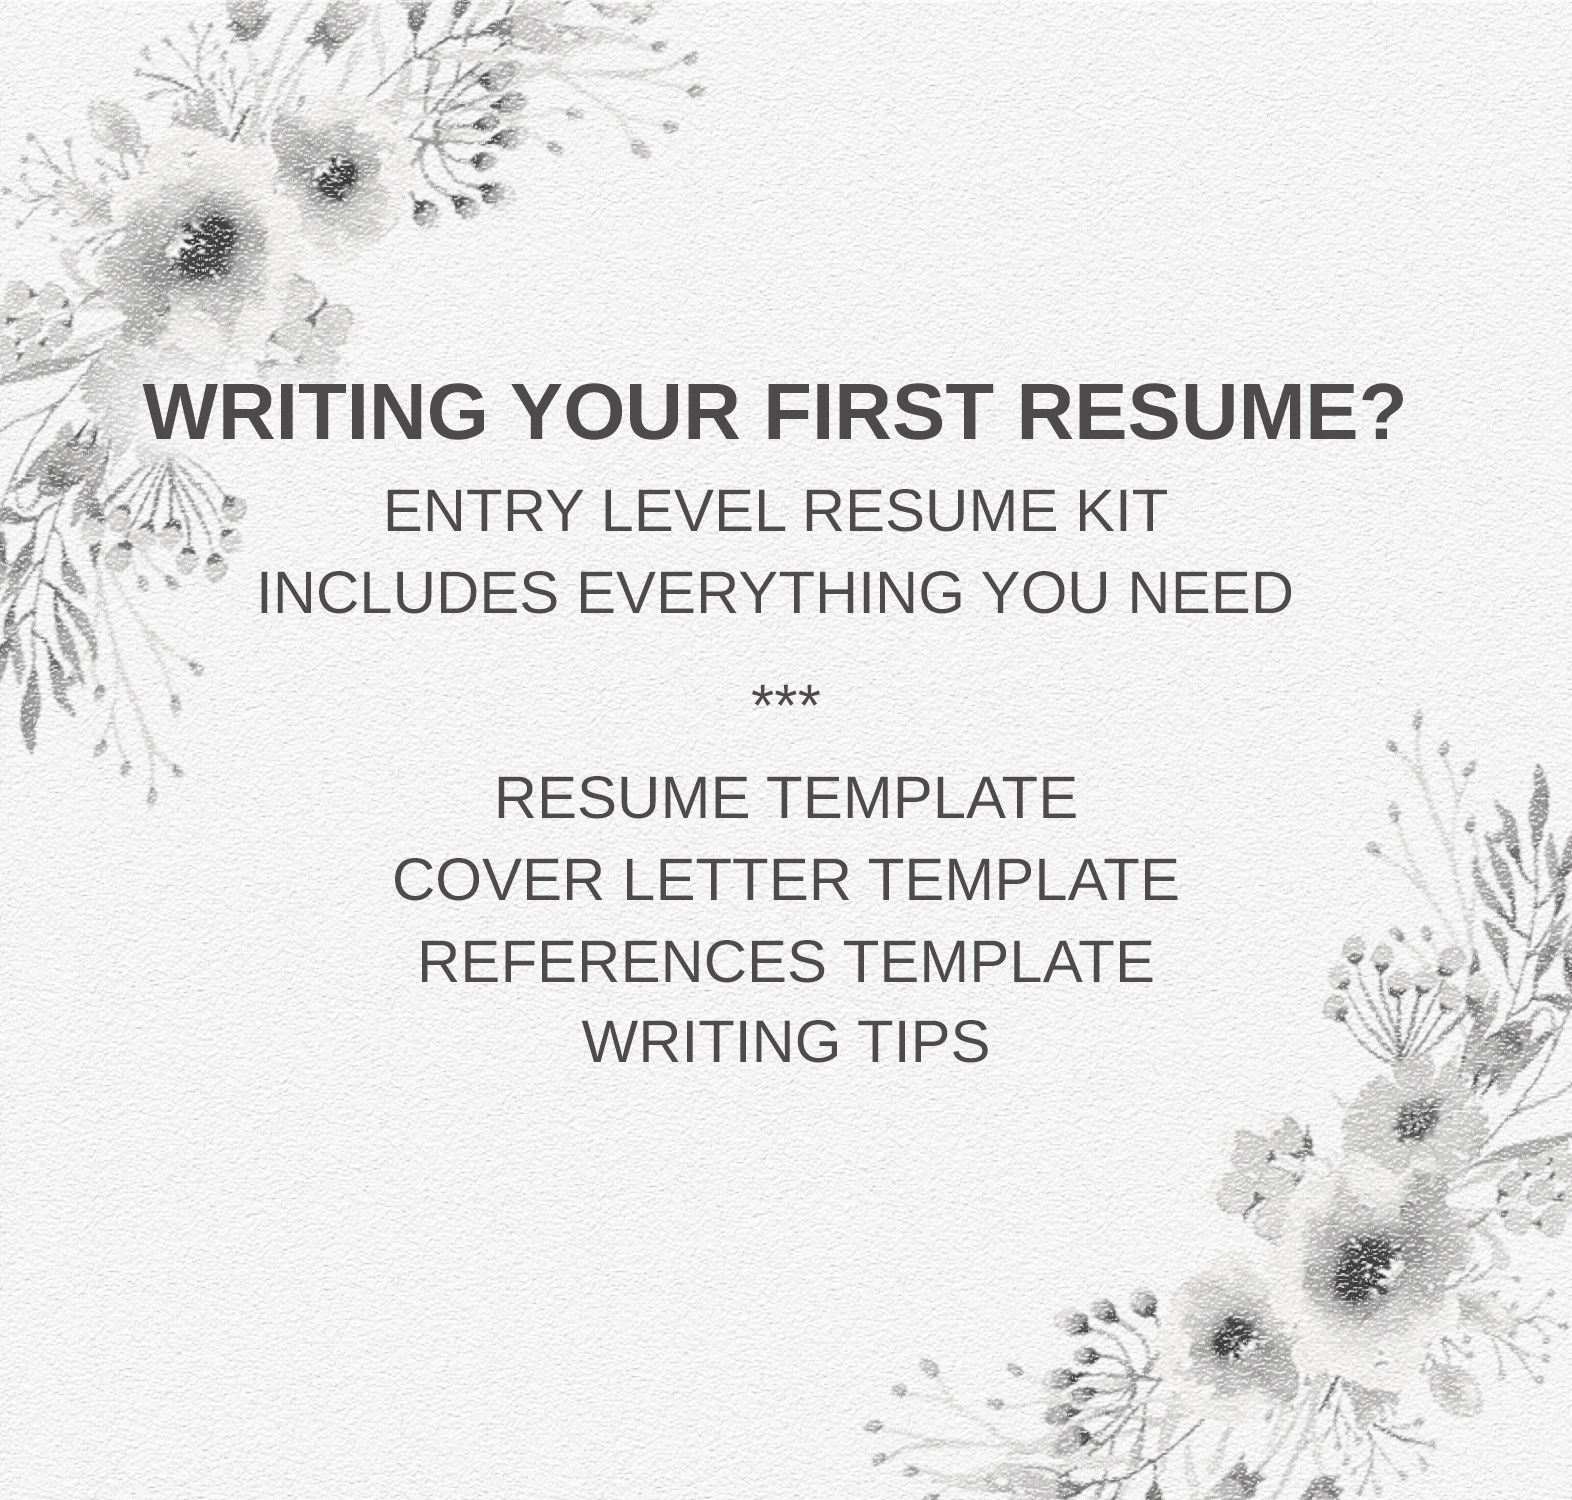 Resume Template Entry Level | Career Starter Pack example image 5